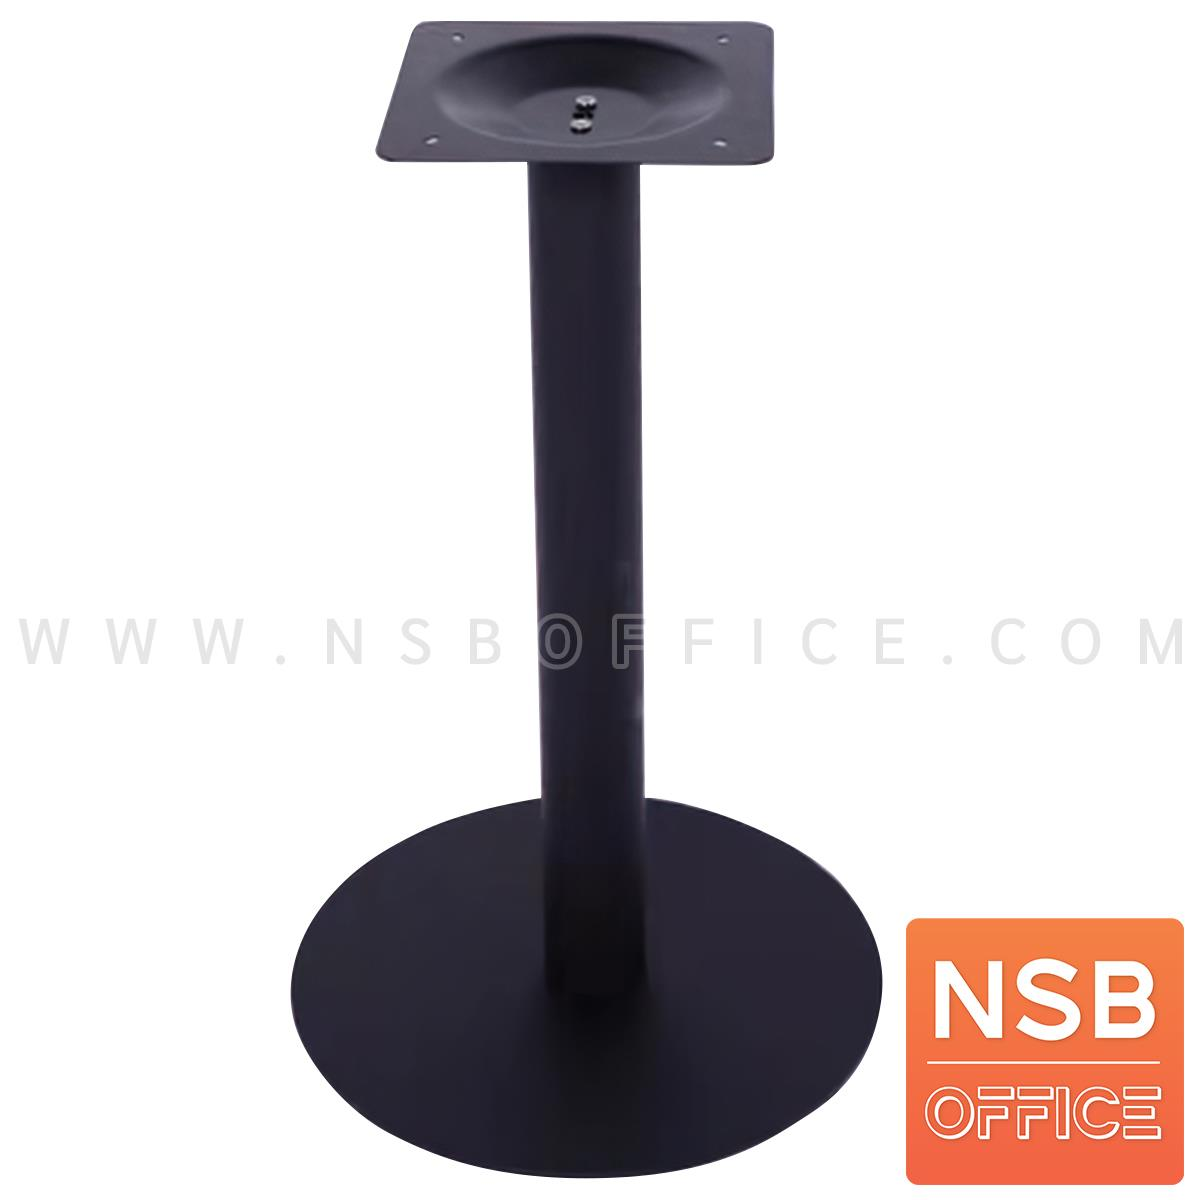 A14A212:โต๊ะบาร์จานกลมแผ่นเรียบ ทำสีดำ รุ่น NANT